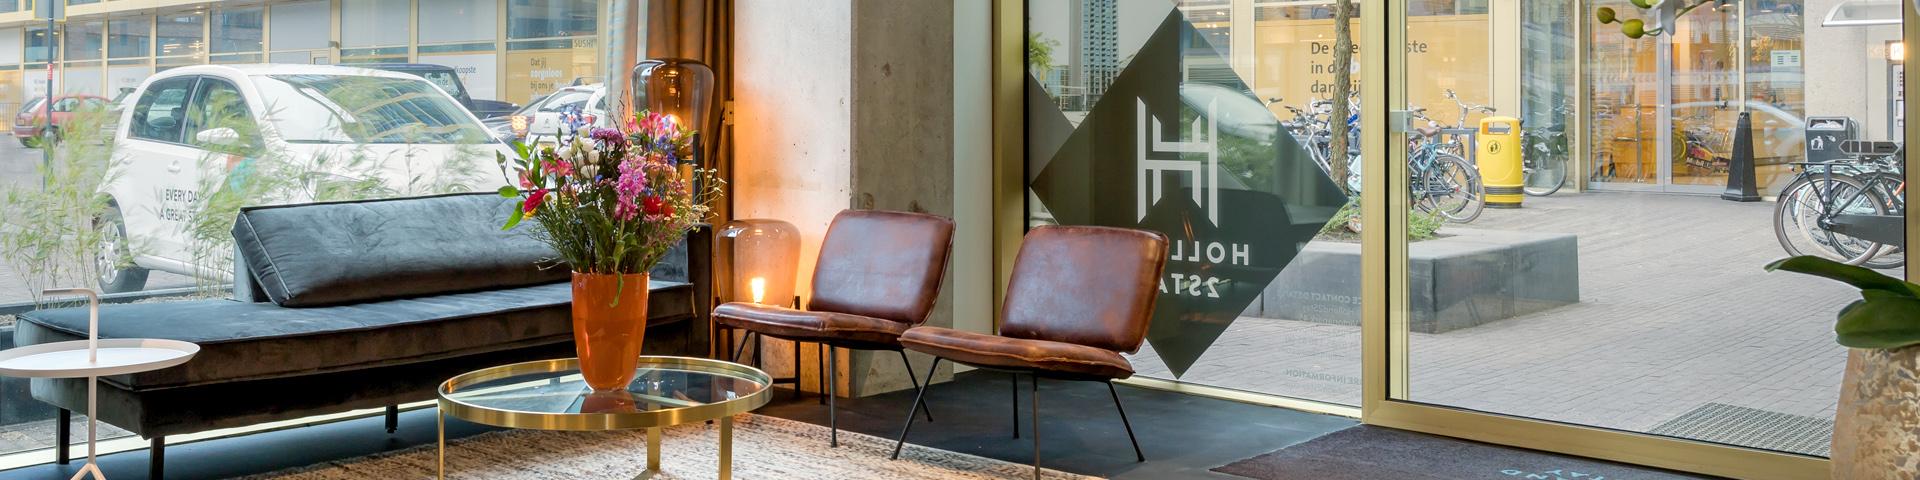 stylish lounge area holland2stay